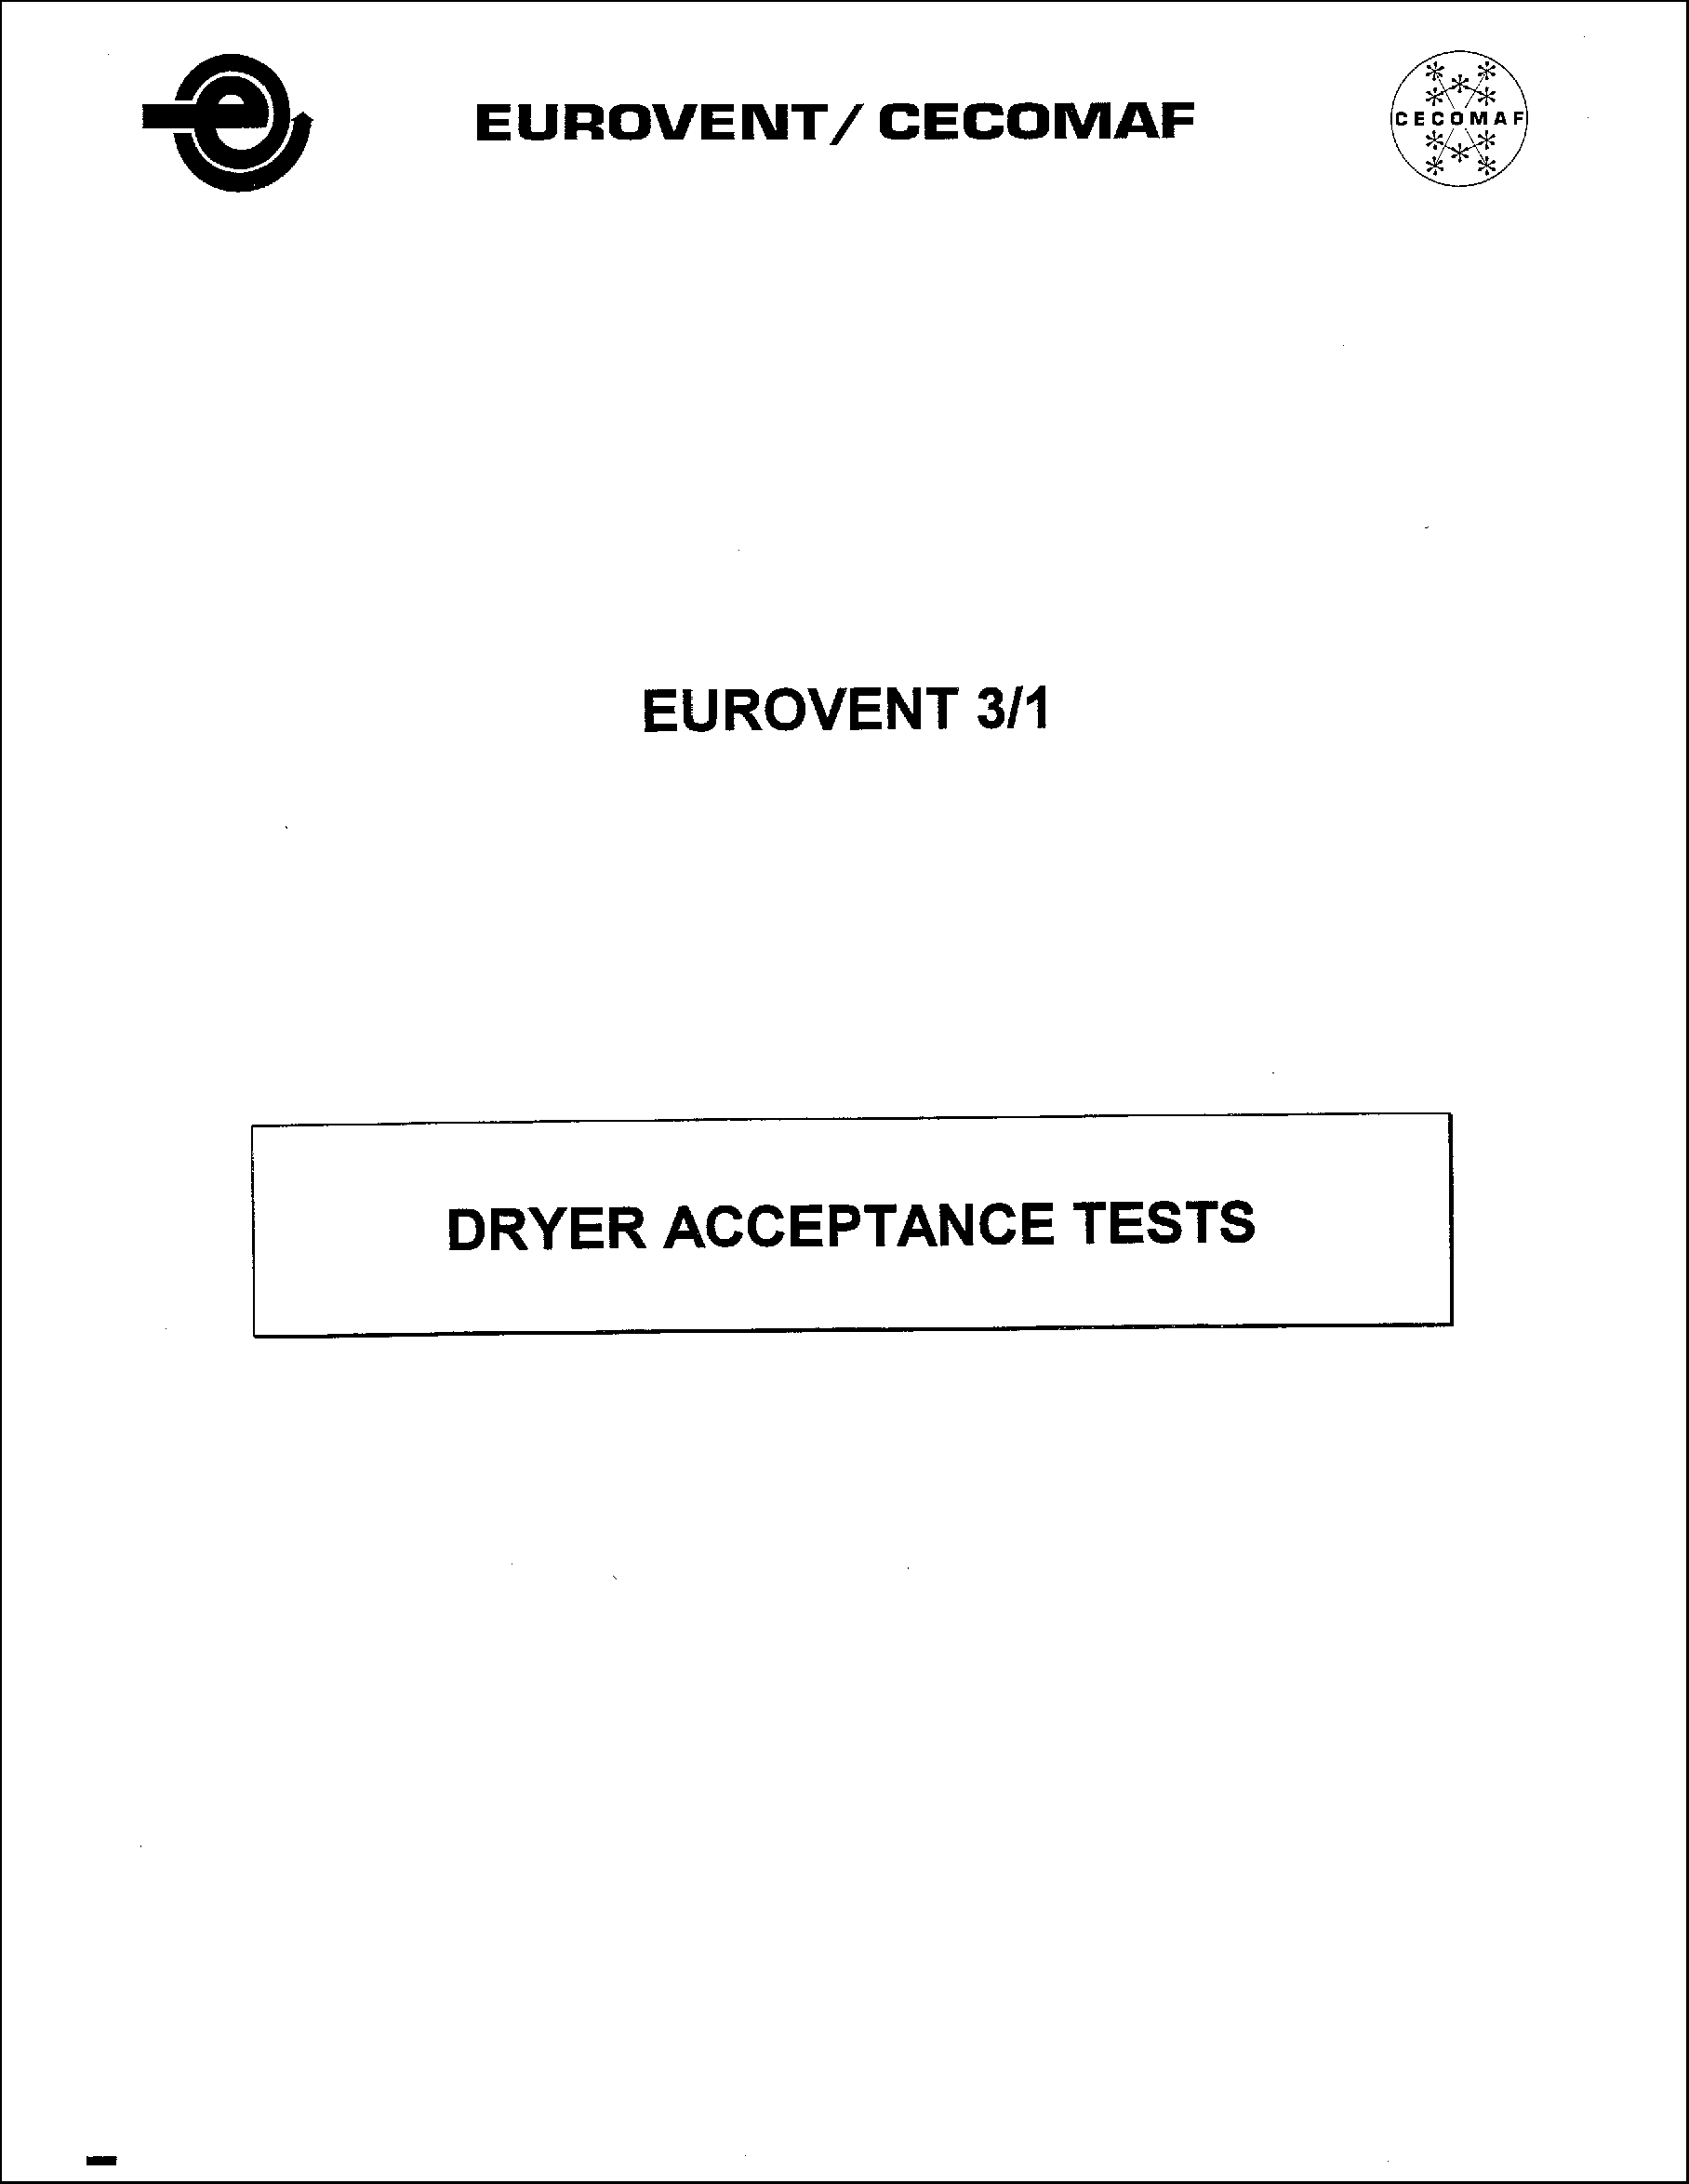 1984 - Dryer acceptance tests